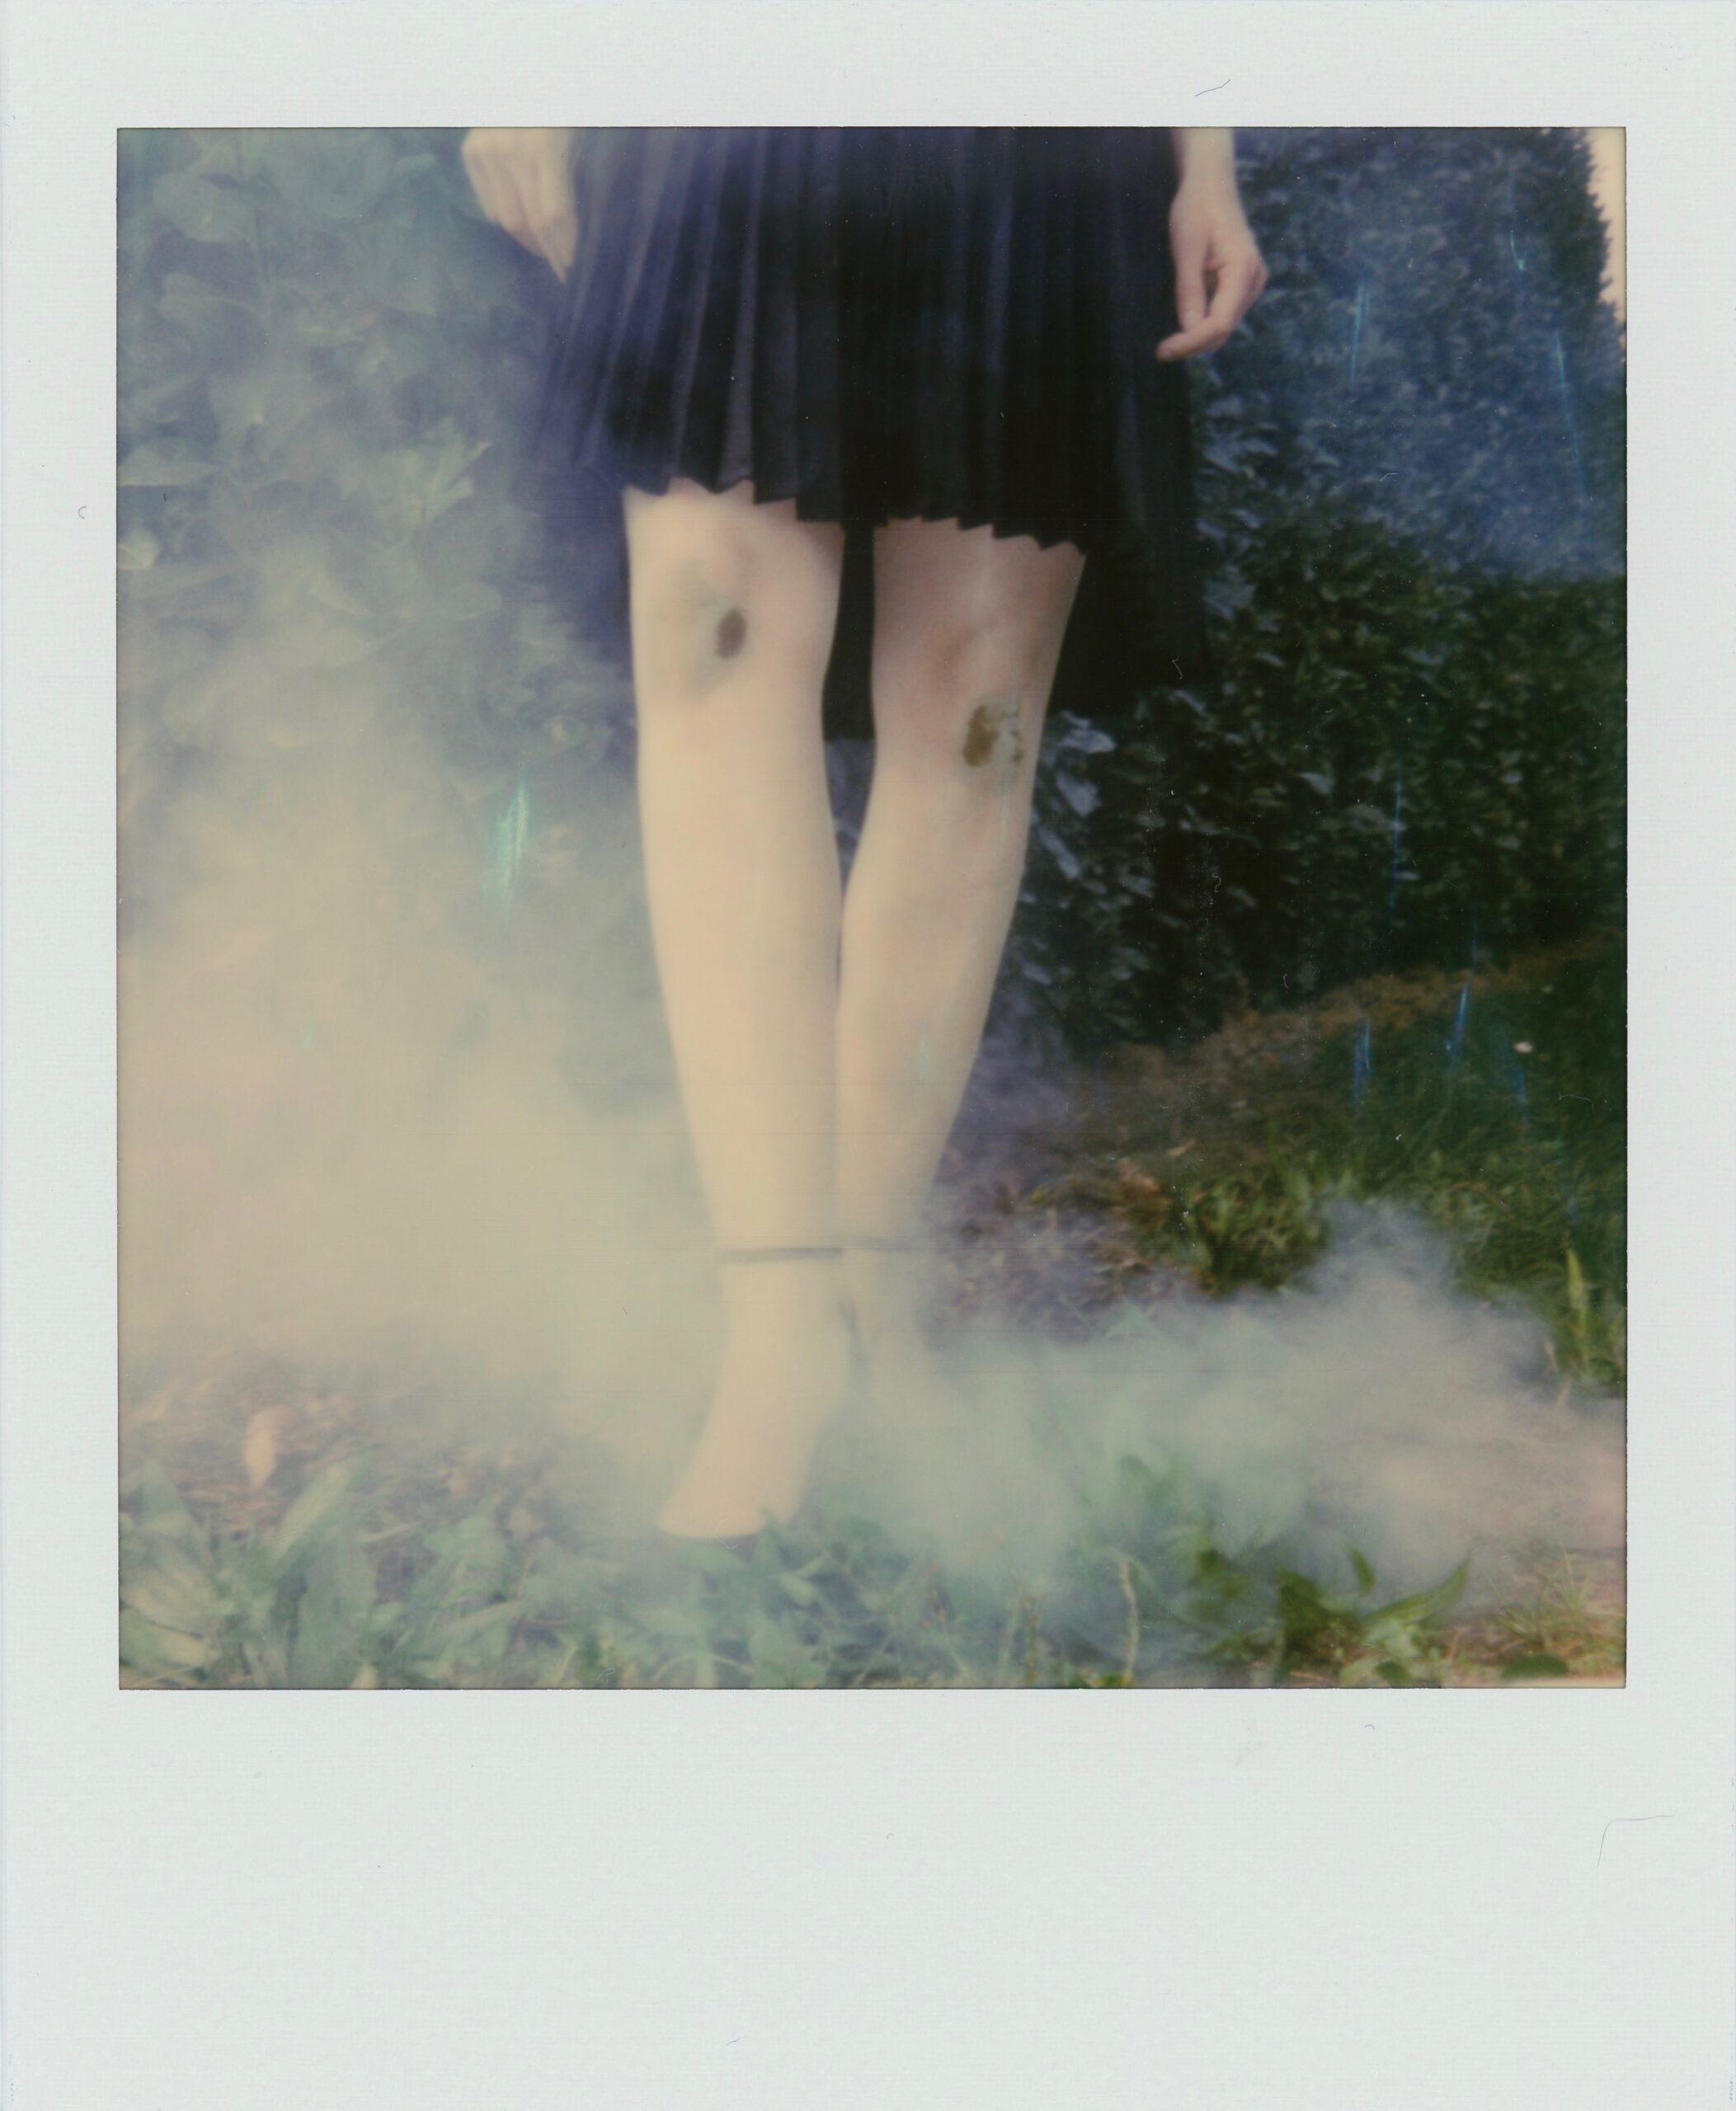 © Raphelson 2020